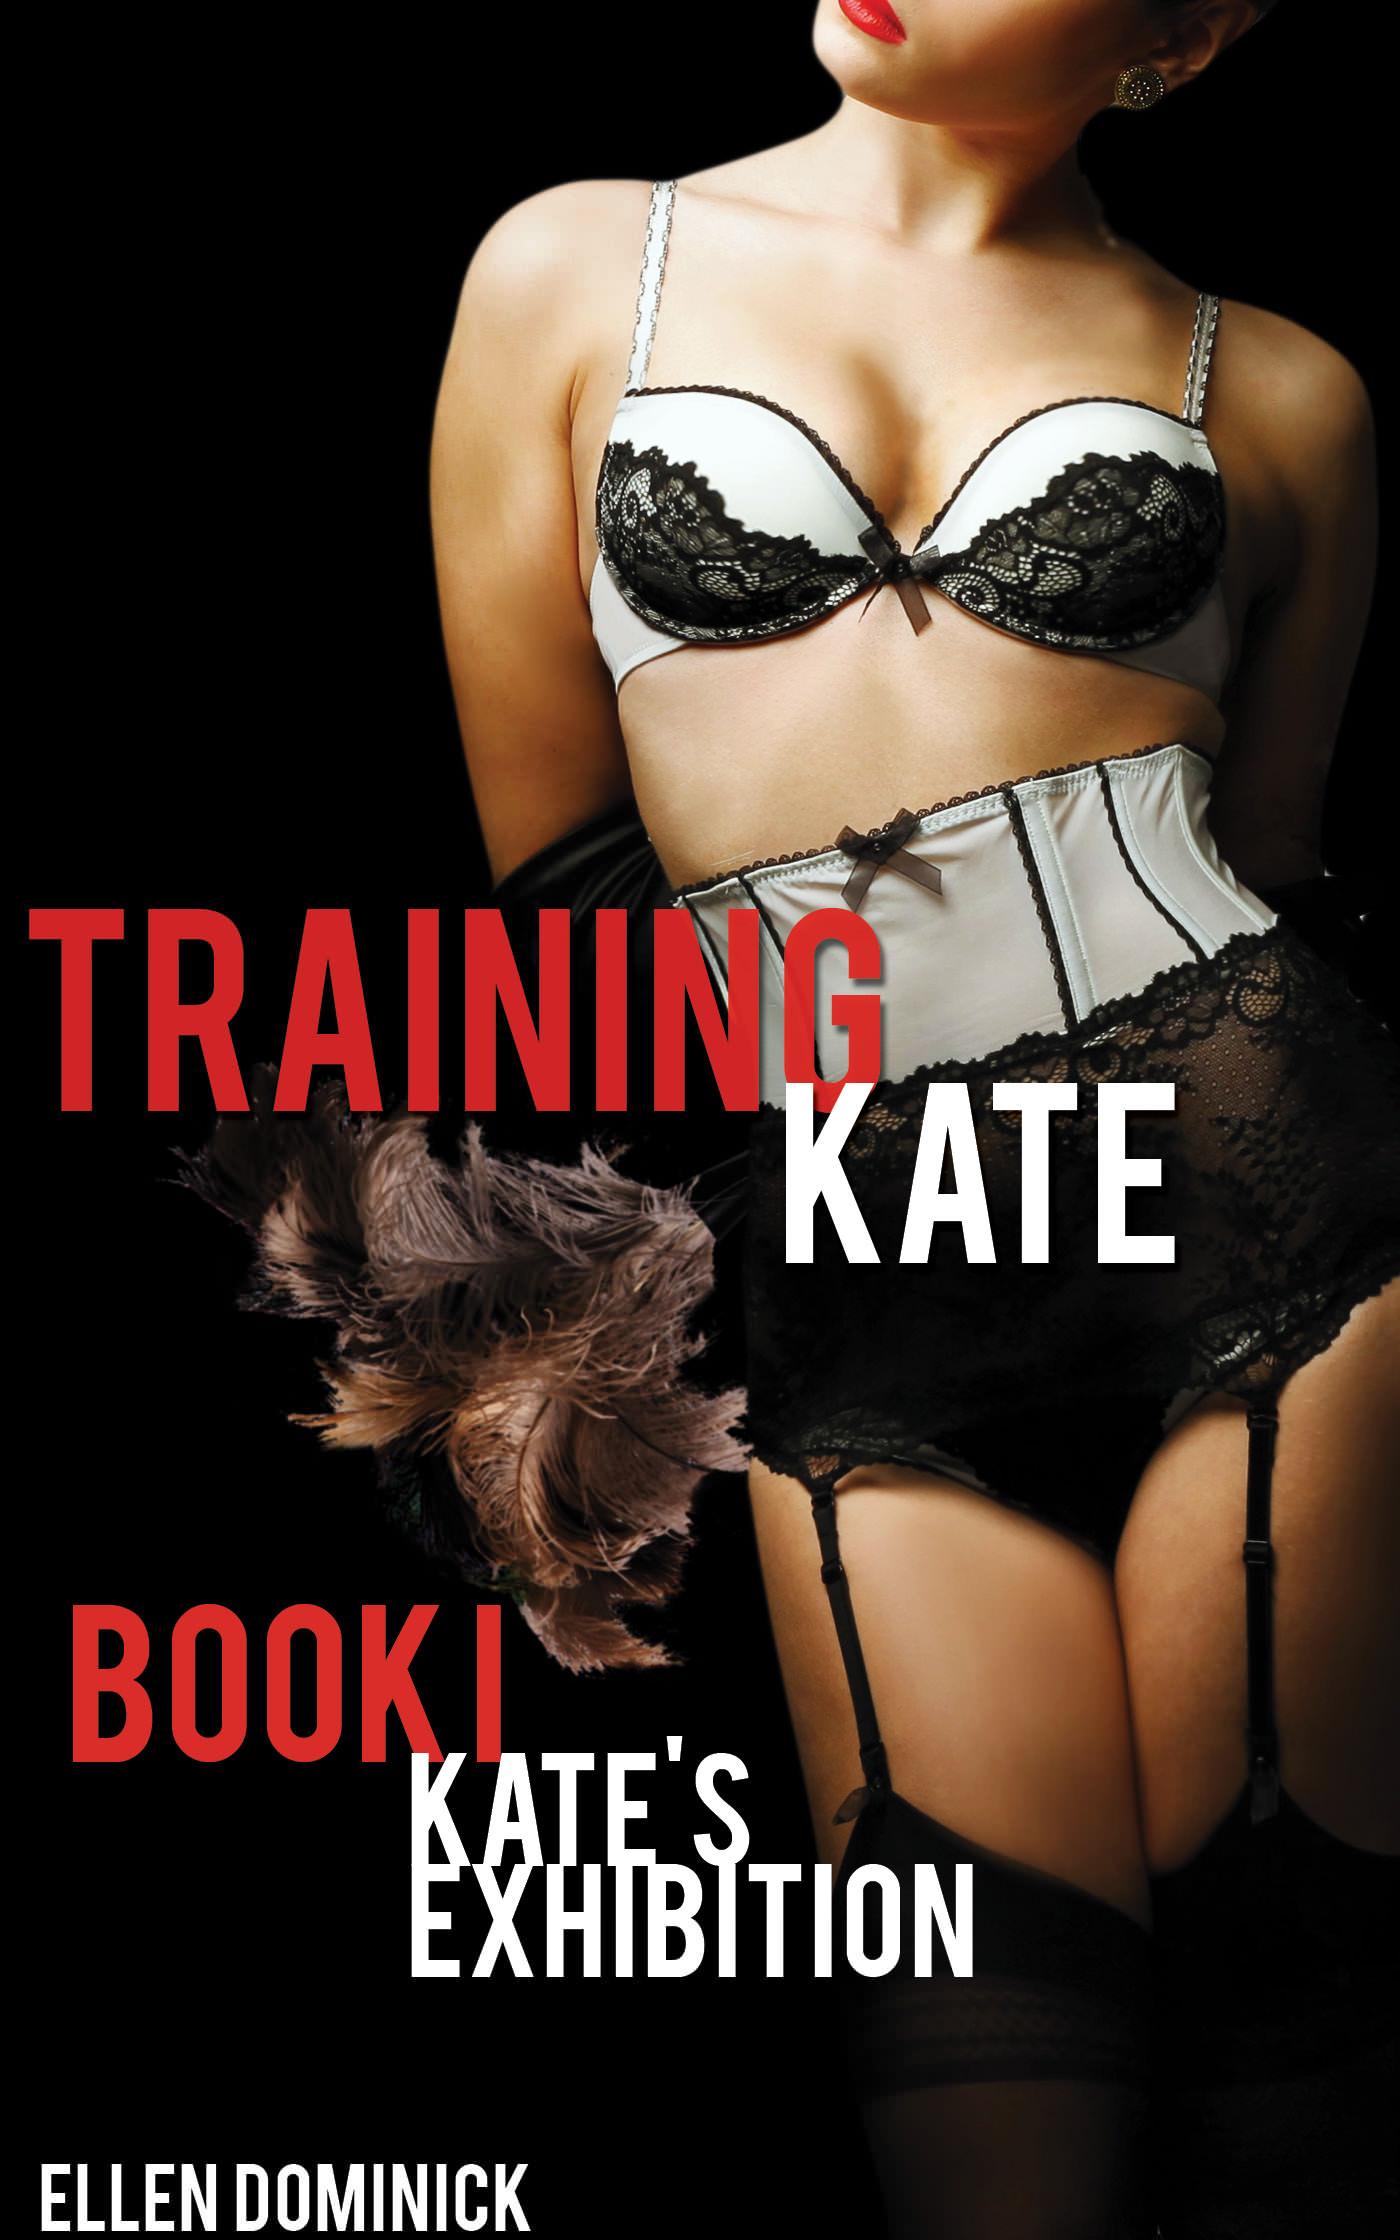 trainingkateone2.jpg